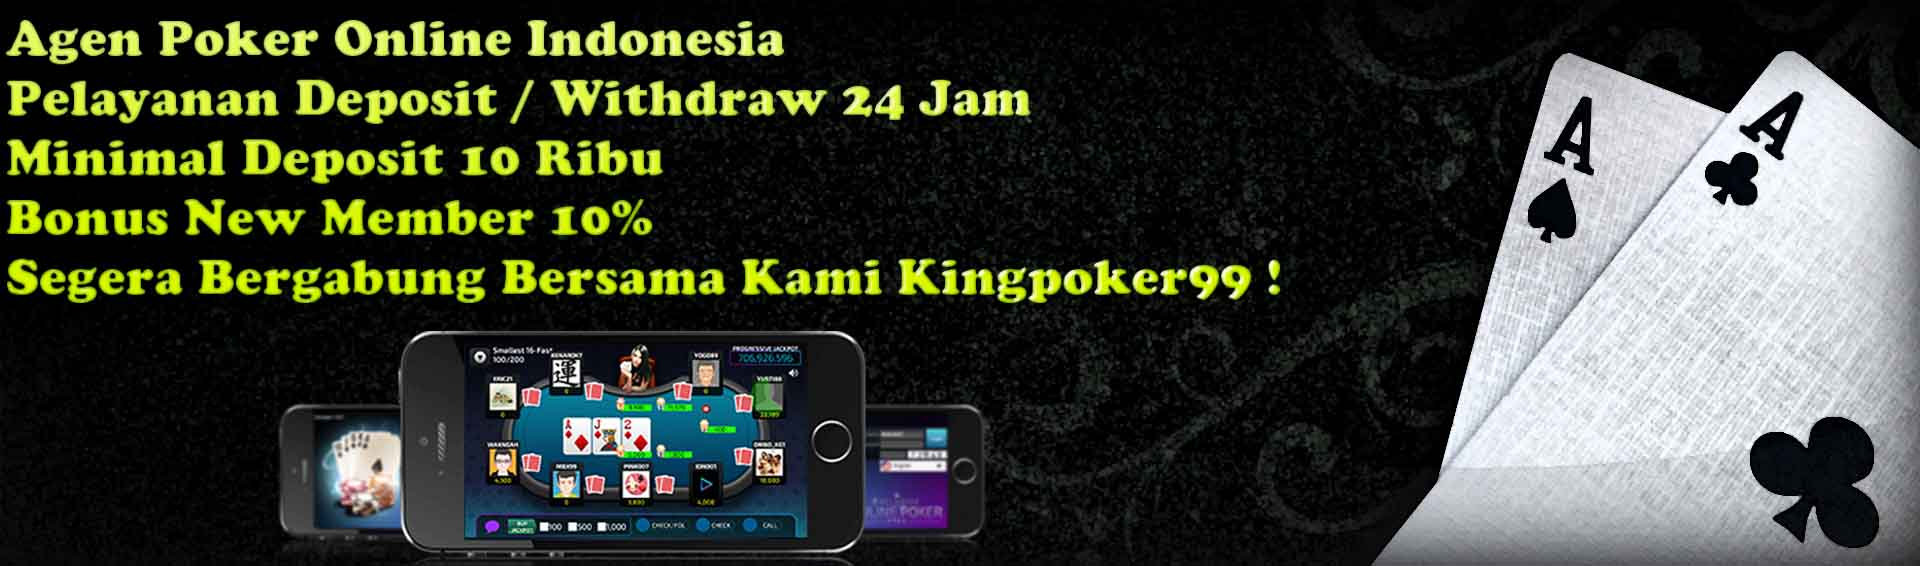 Daftar Poker Online Deposit 10000